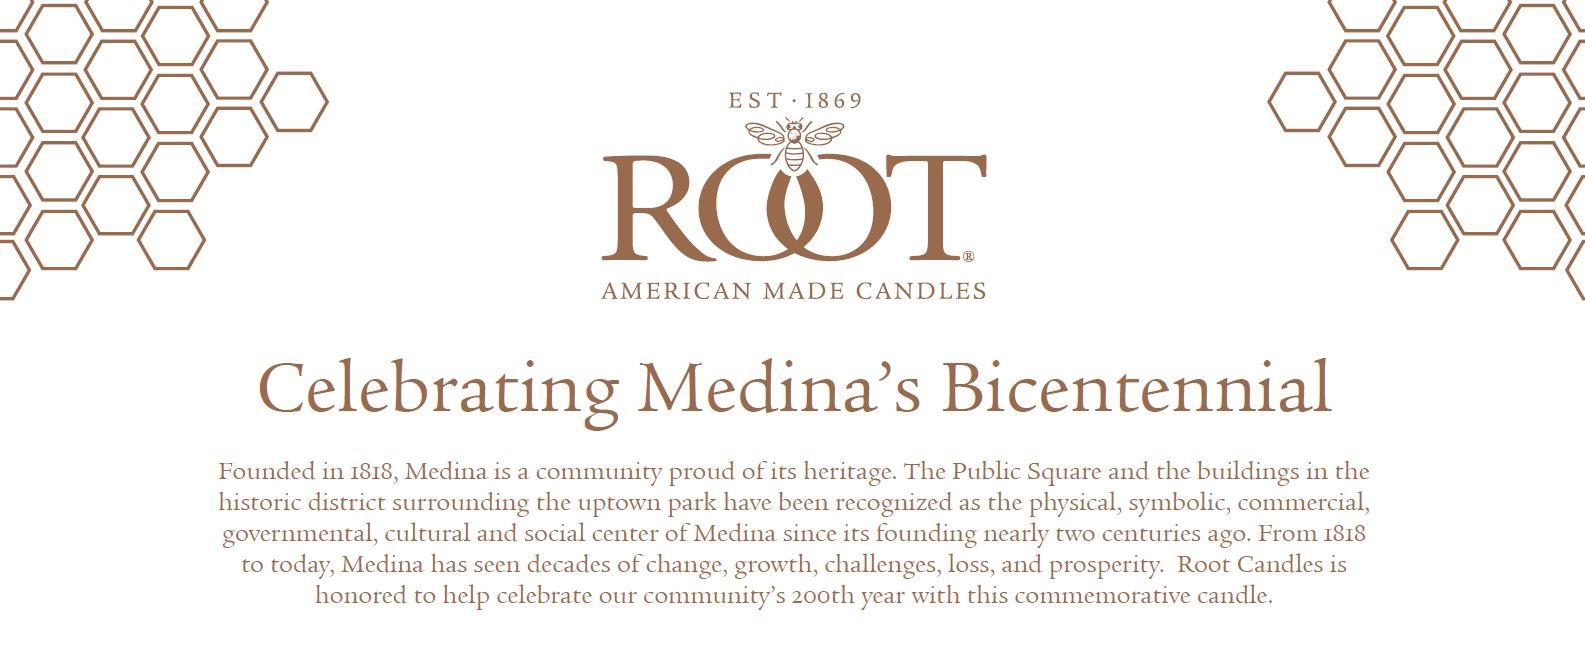 medina-bicentennial-slider.jpg